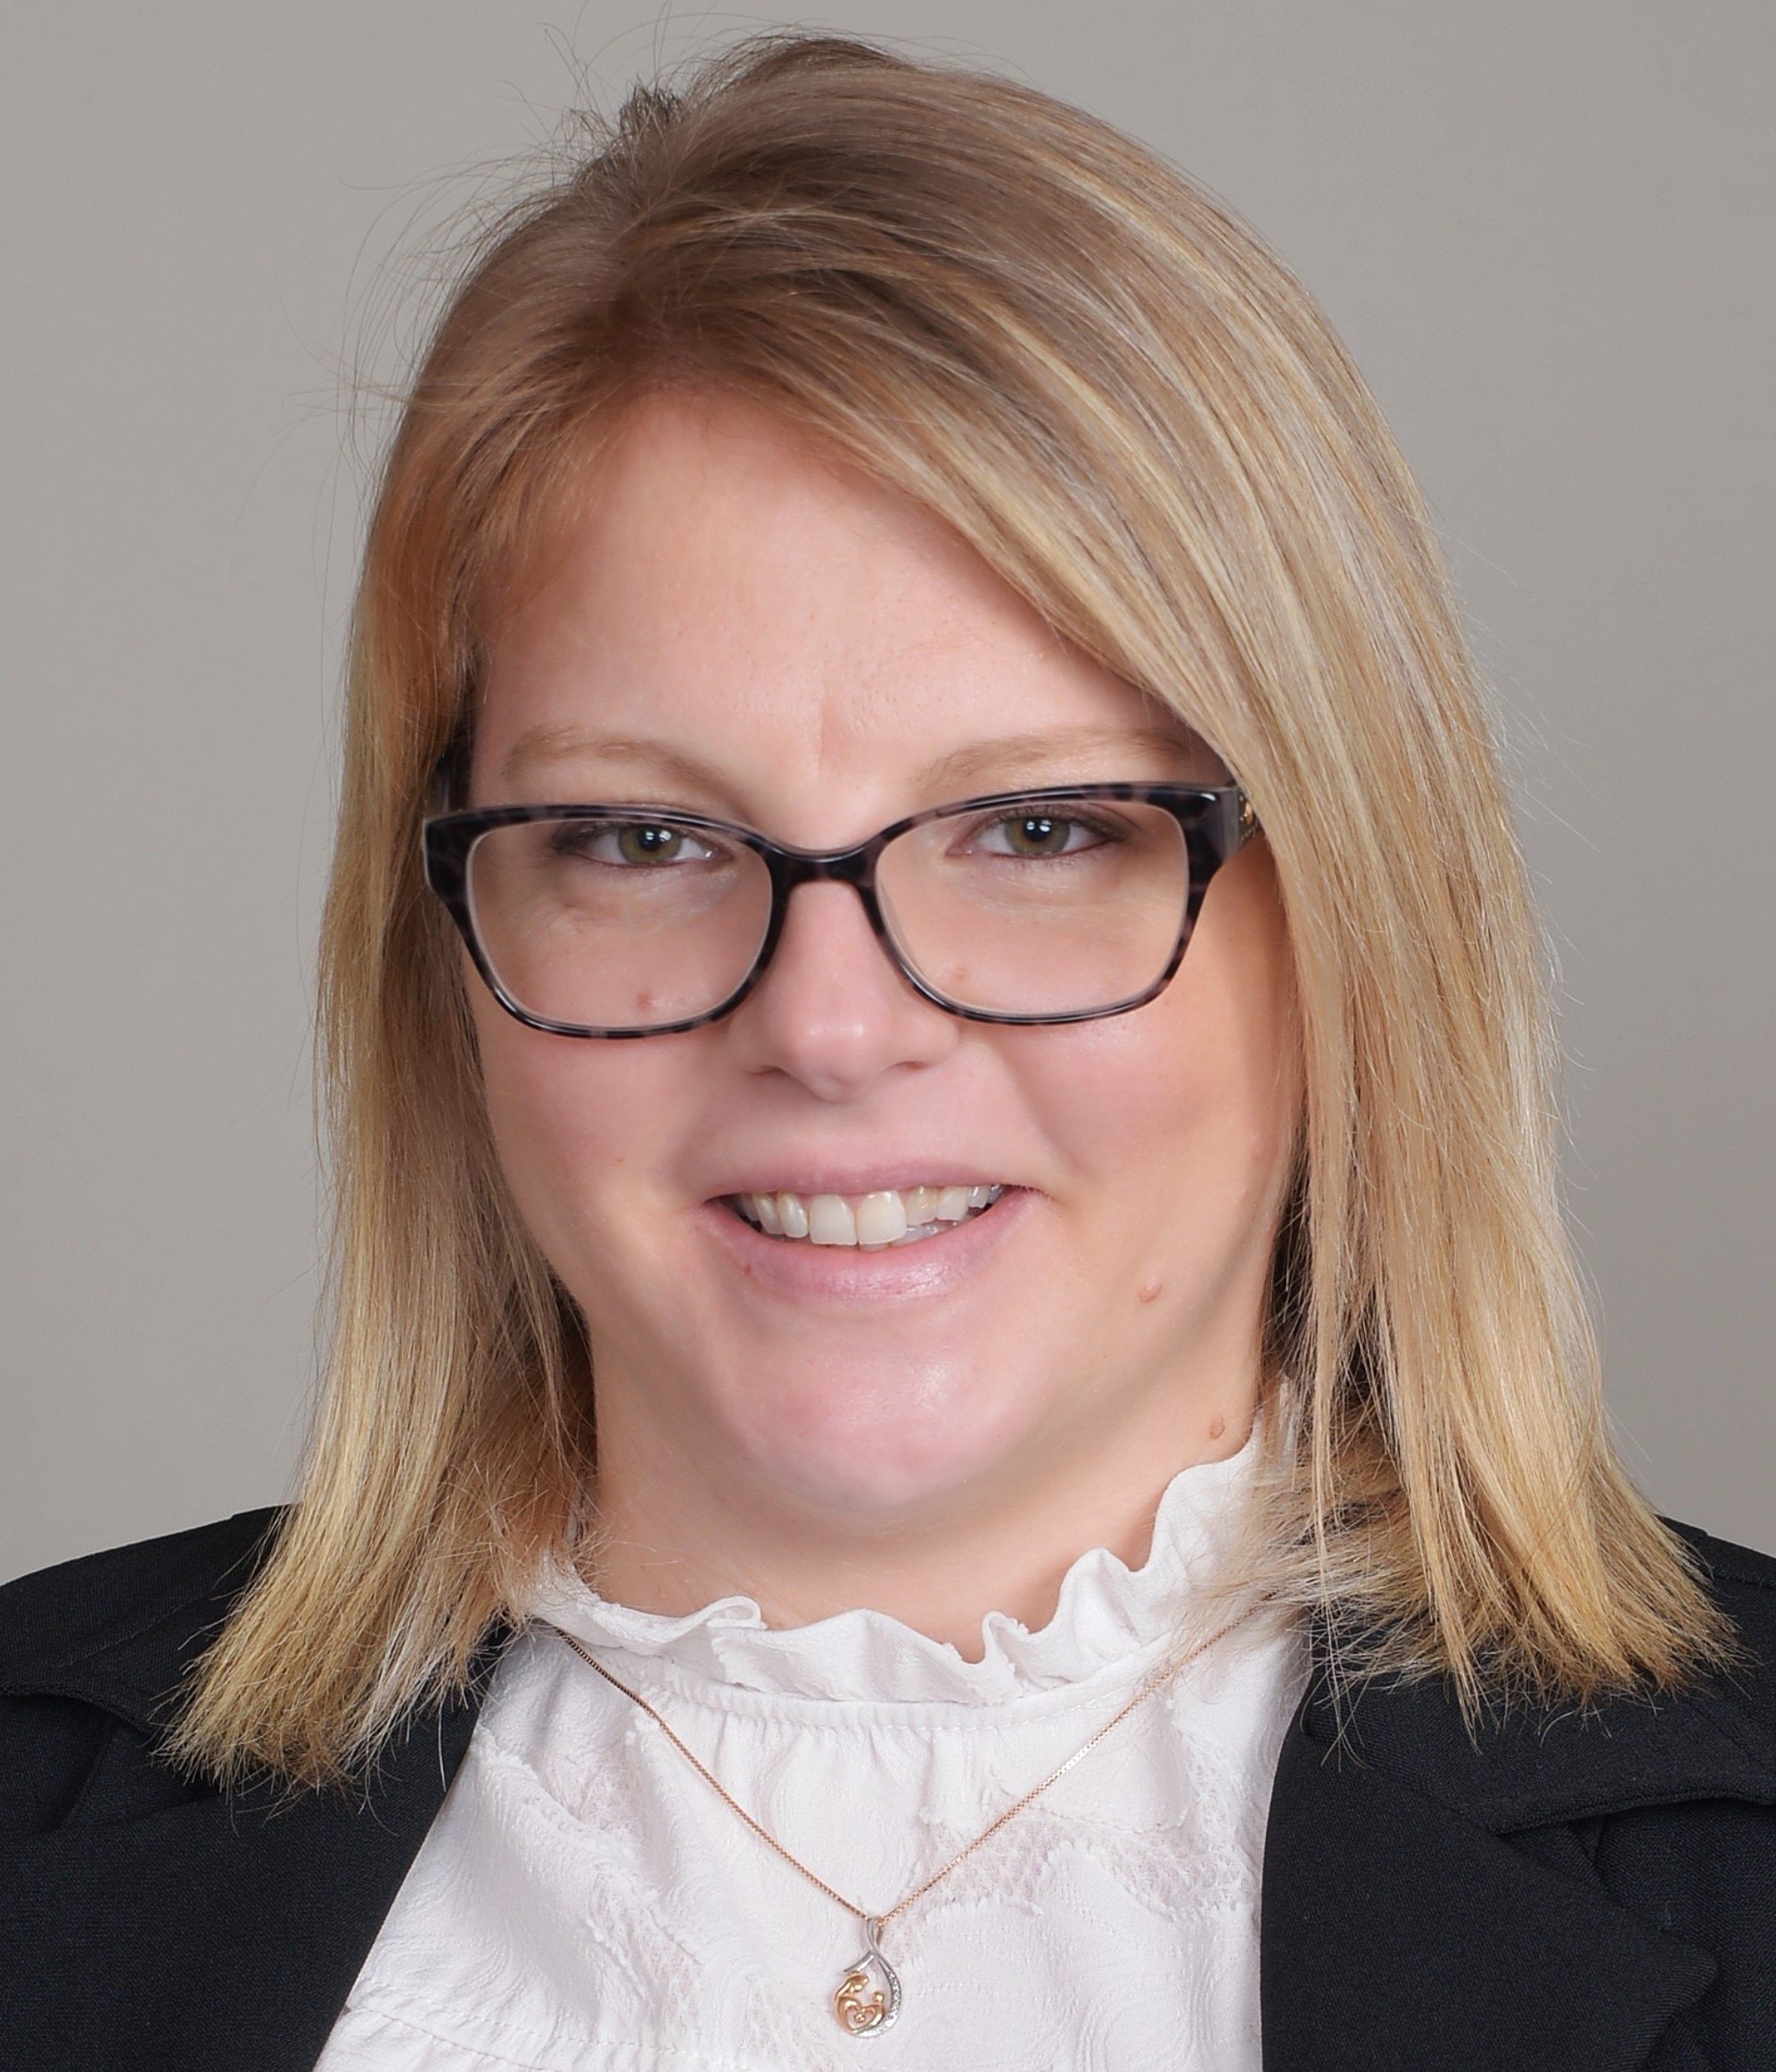 CHRISTINA BRADLEY Financial Professional & Insurance Agent